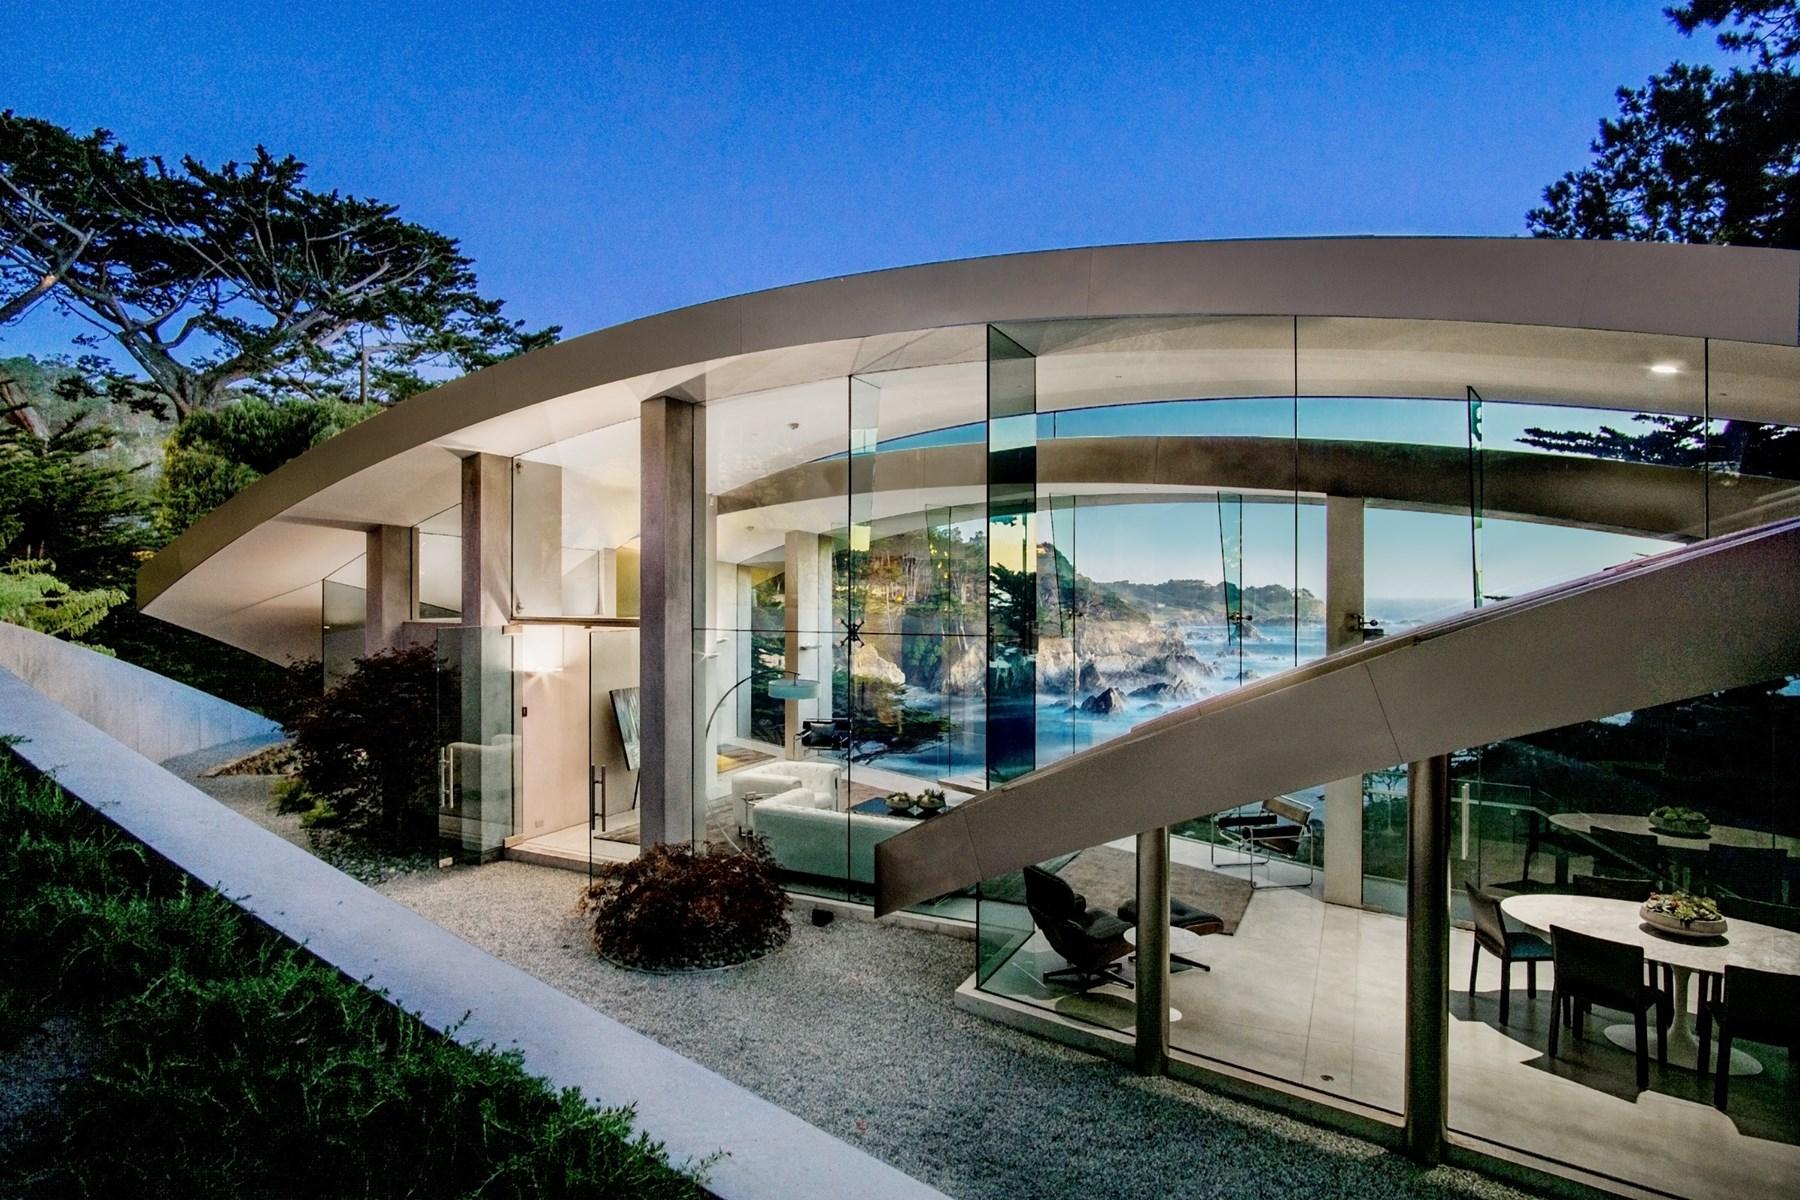 Amazing glass house